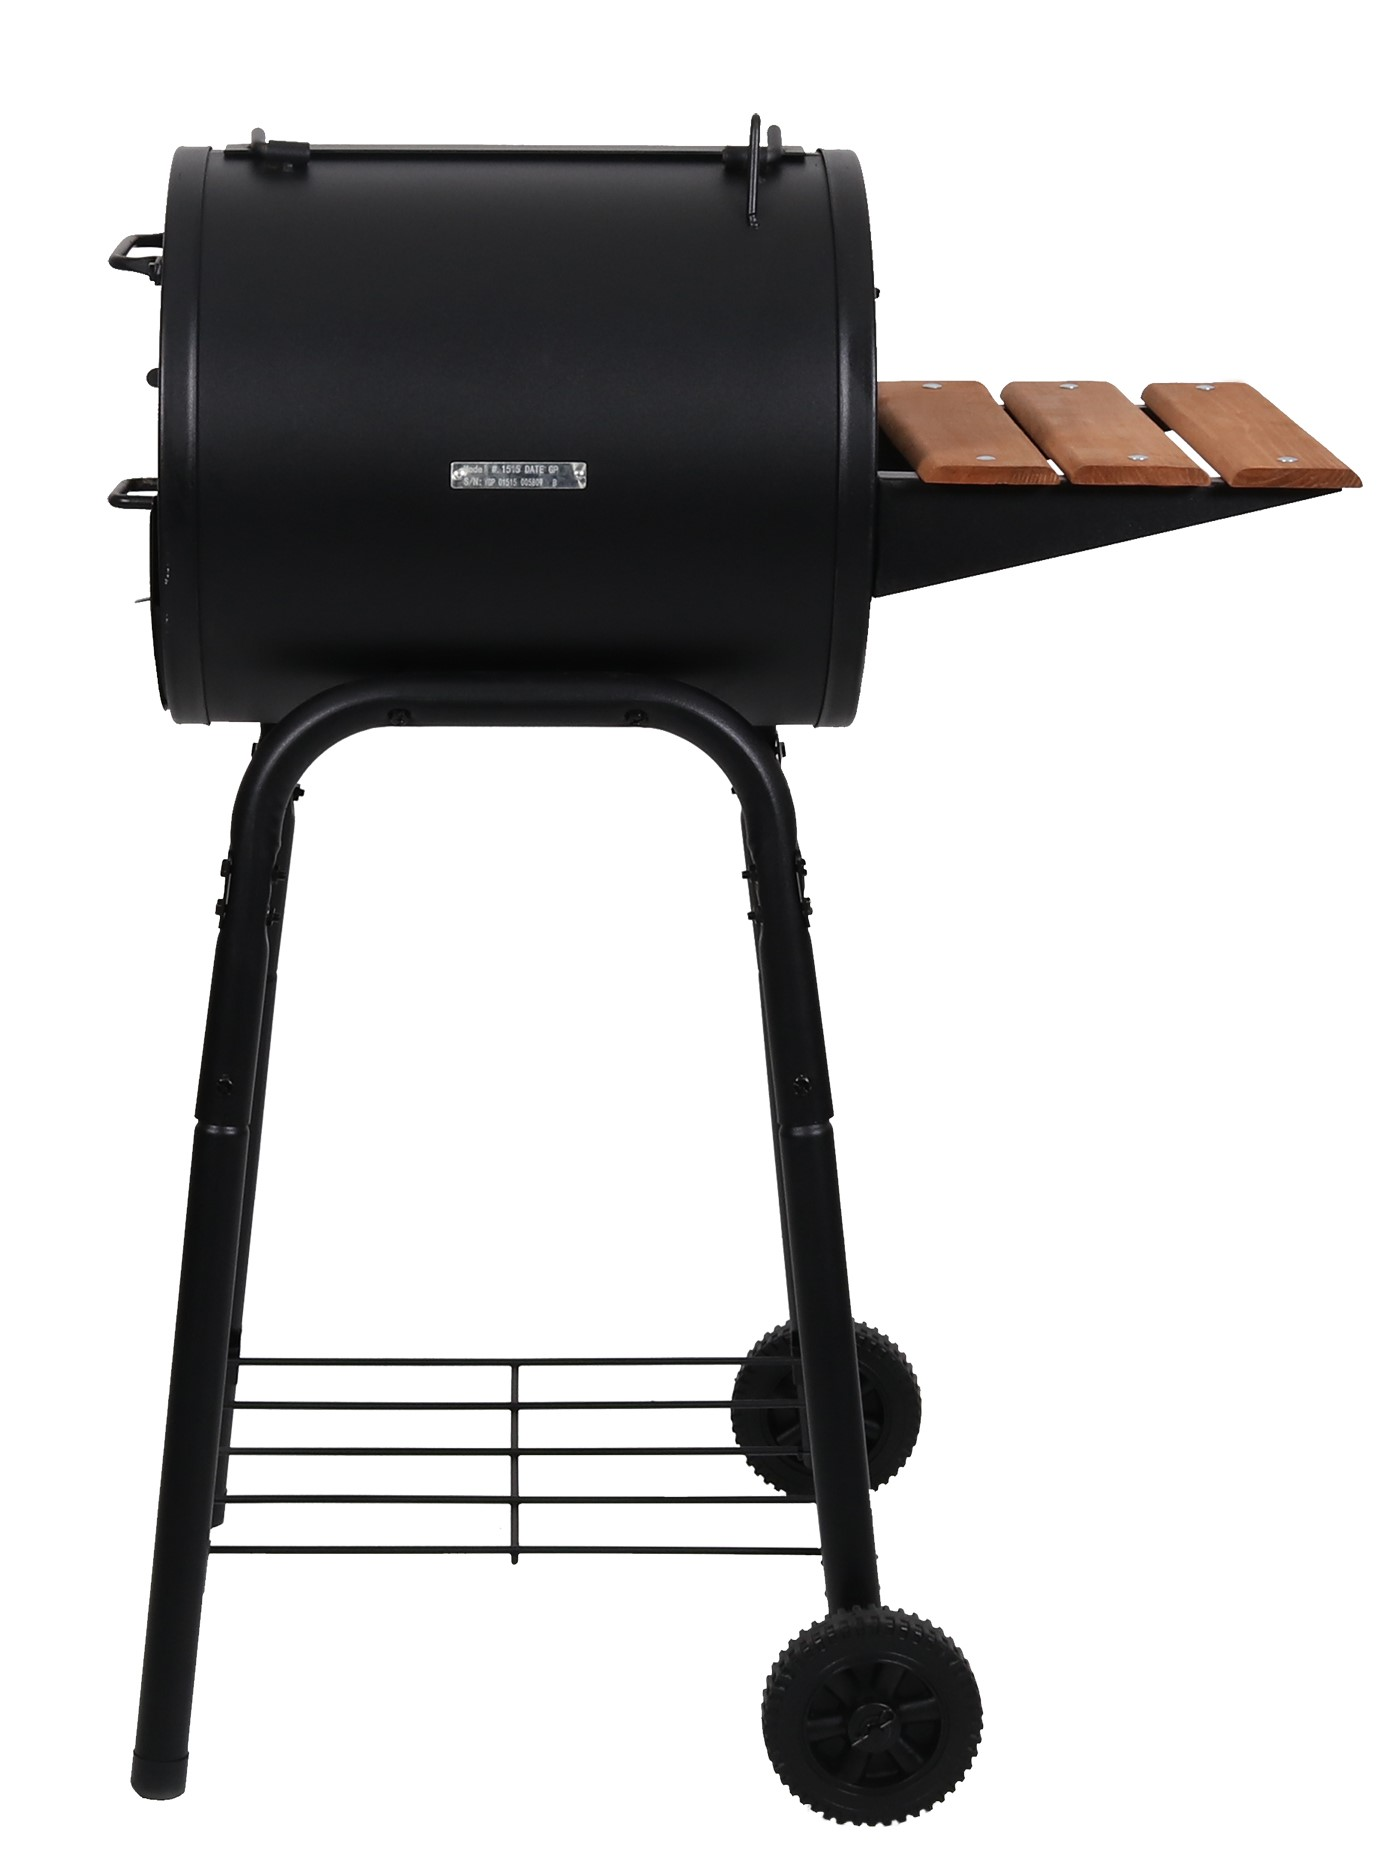 Char Griller Patio Pro Charcoal Grill Black E1515 Walmart Com